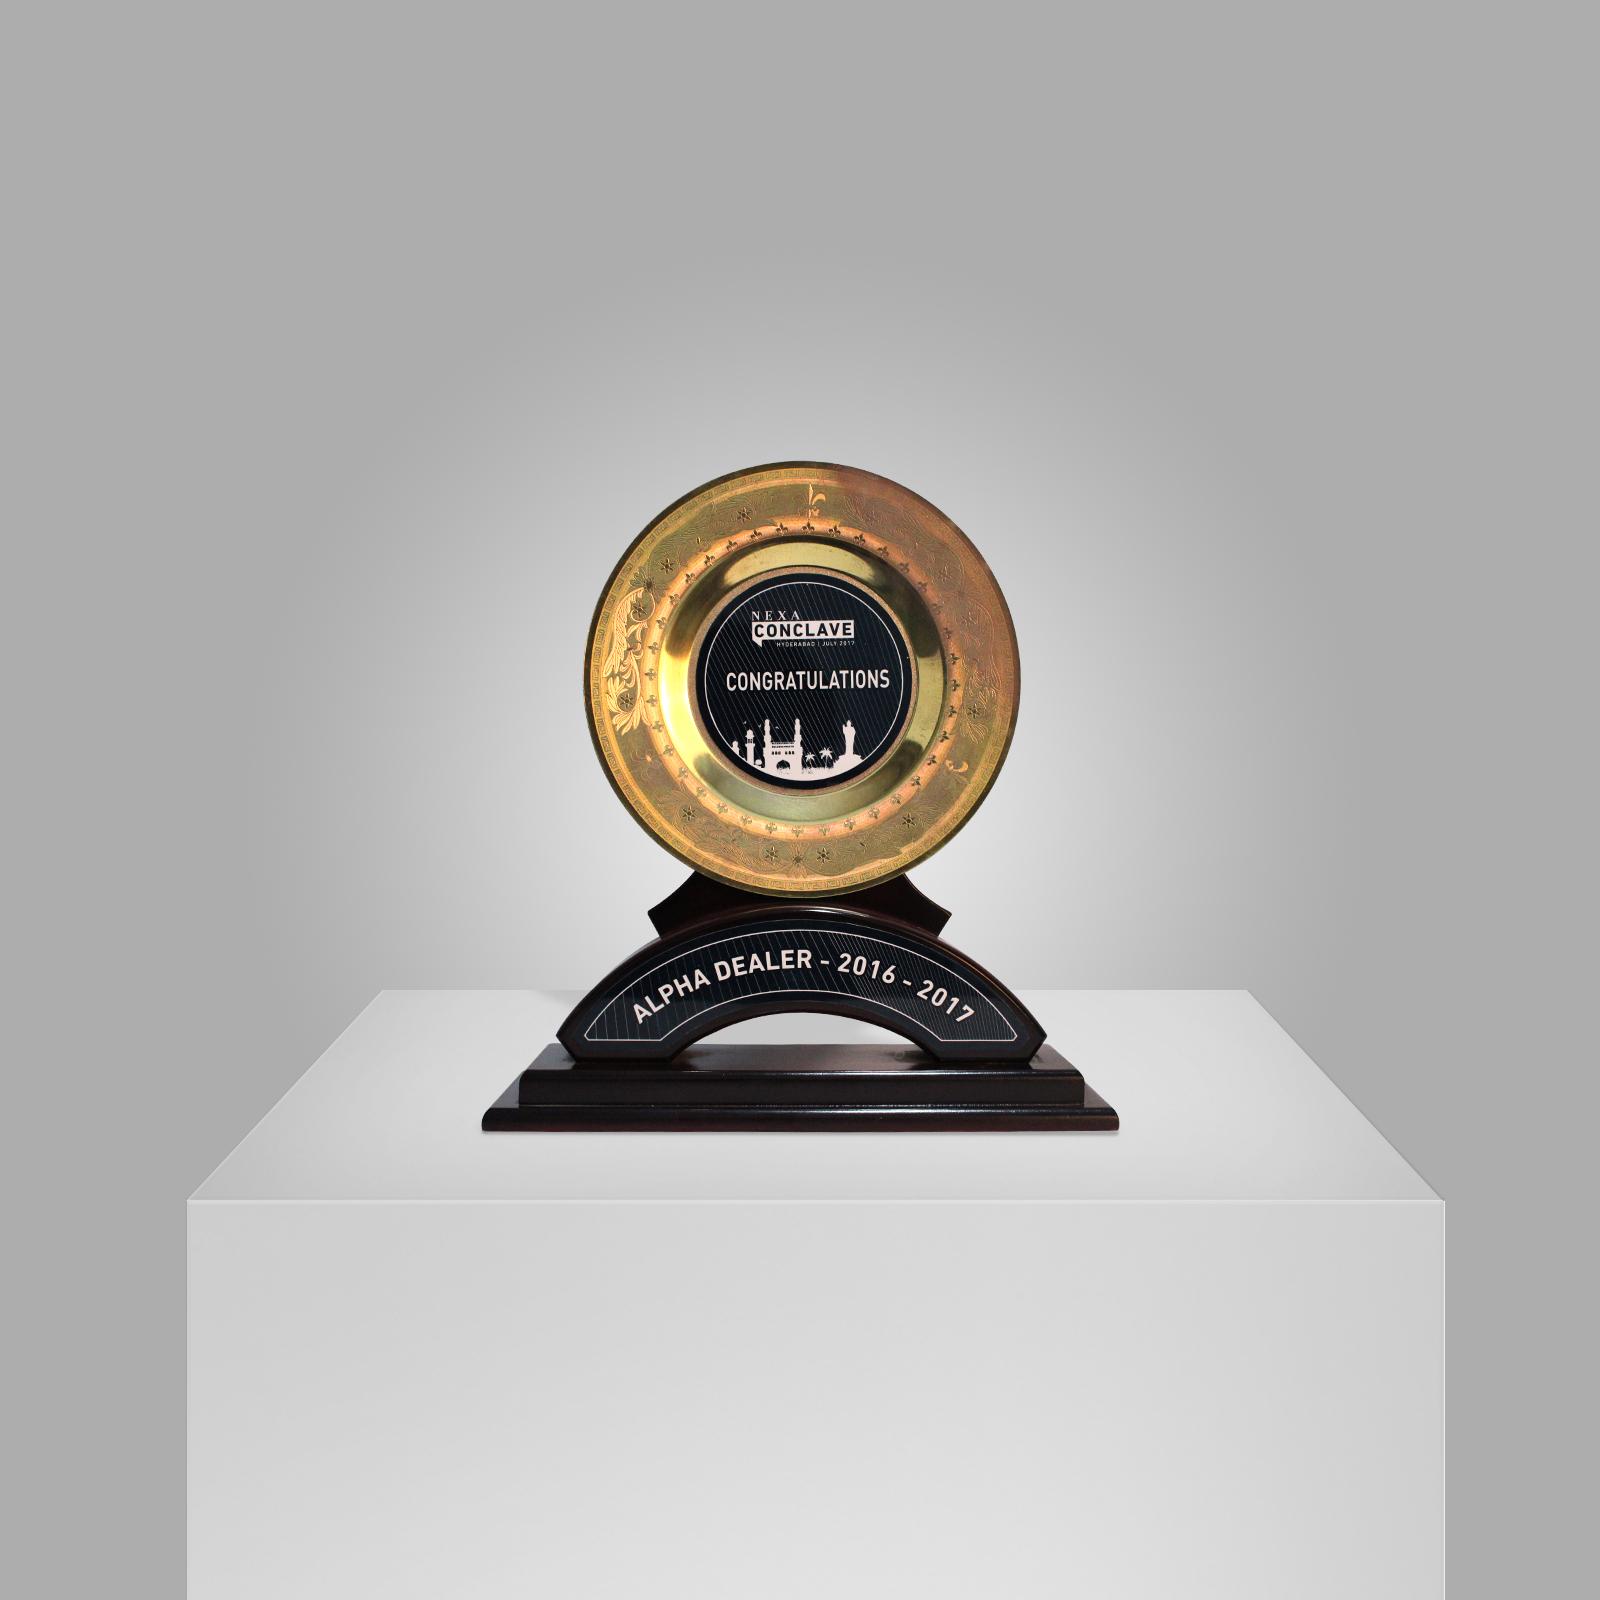 Nexa-alpha-dealer-award-2016-2017